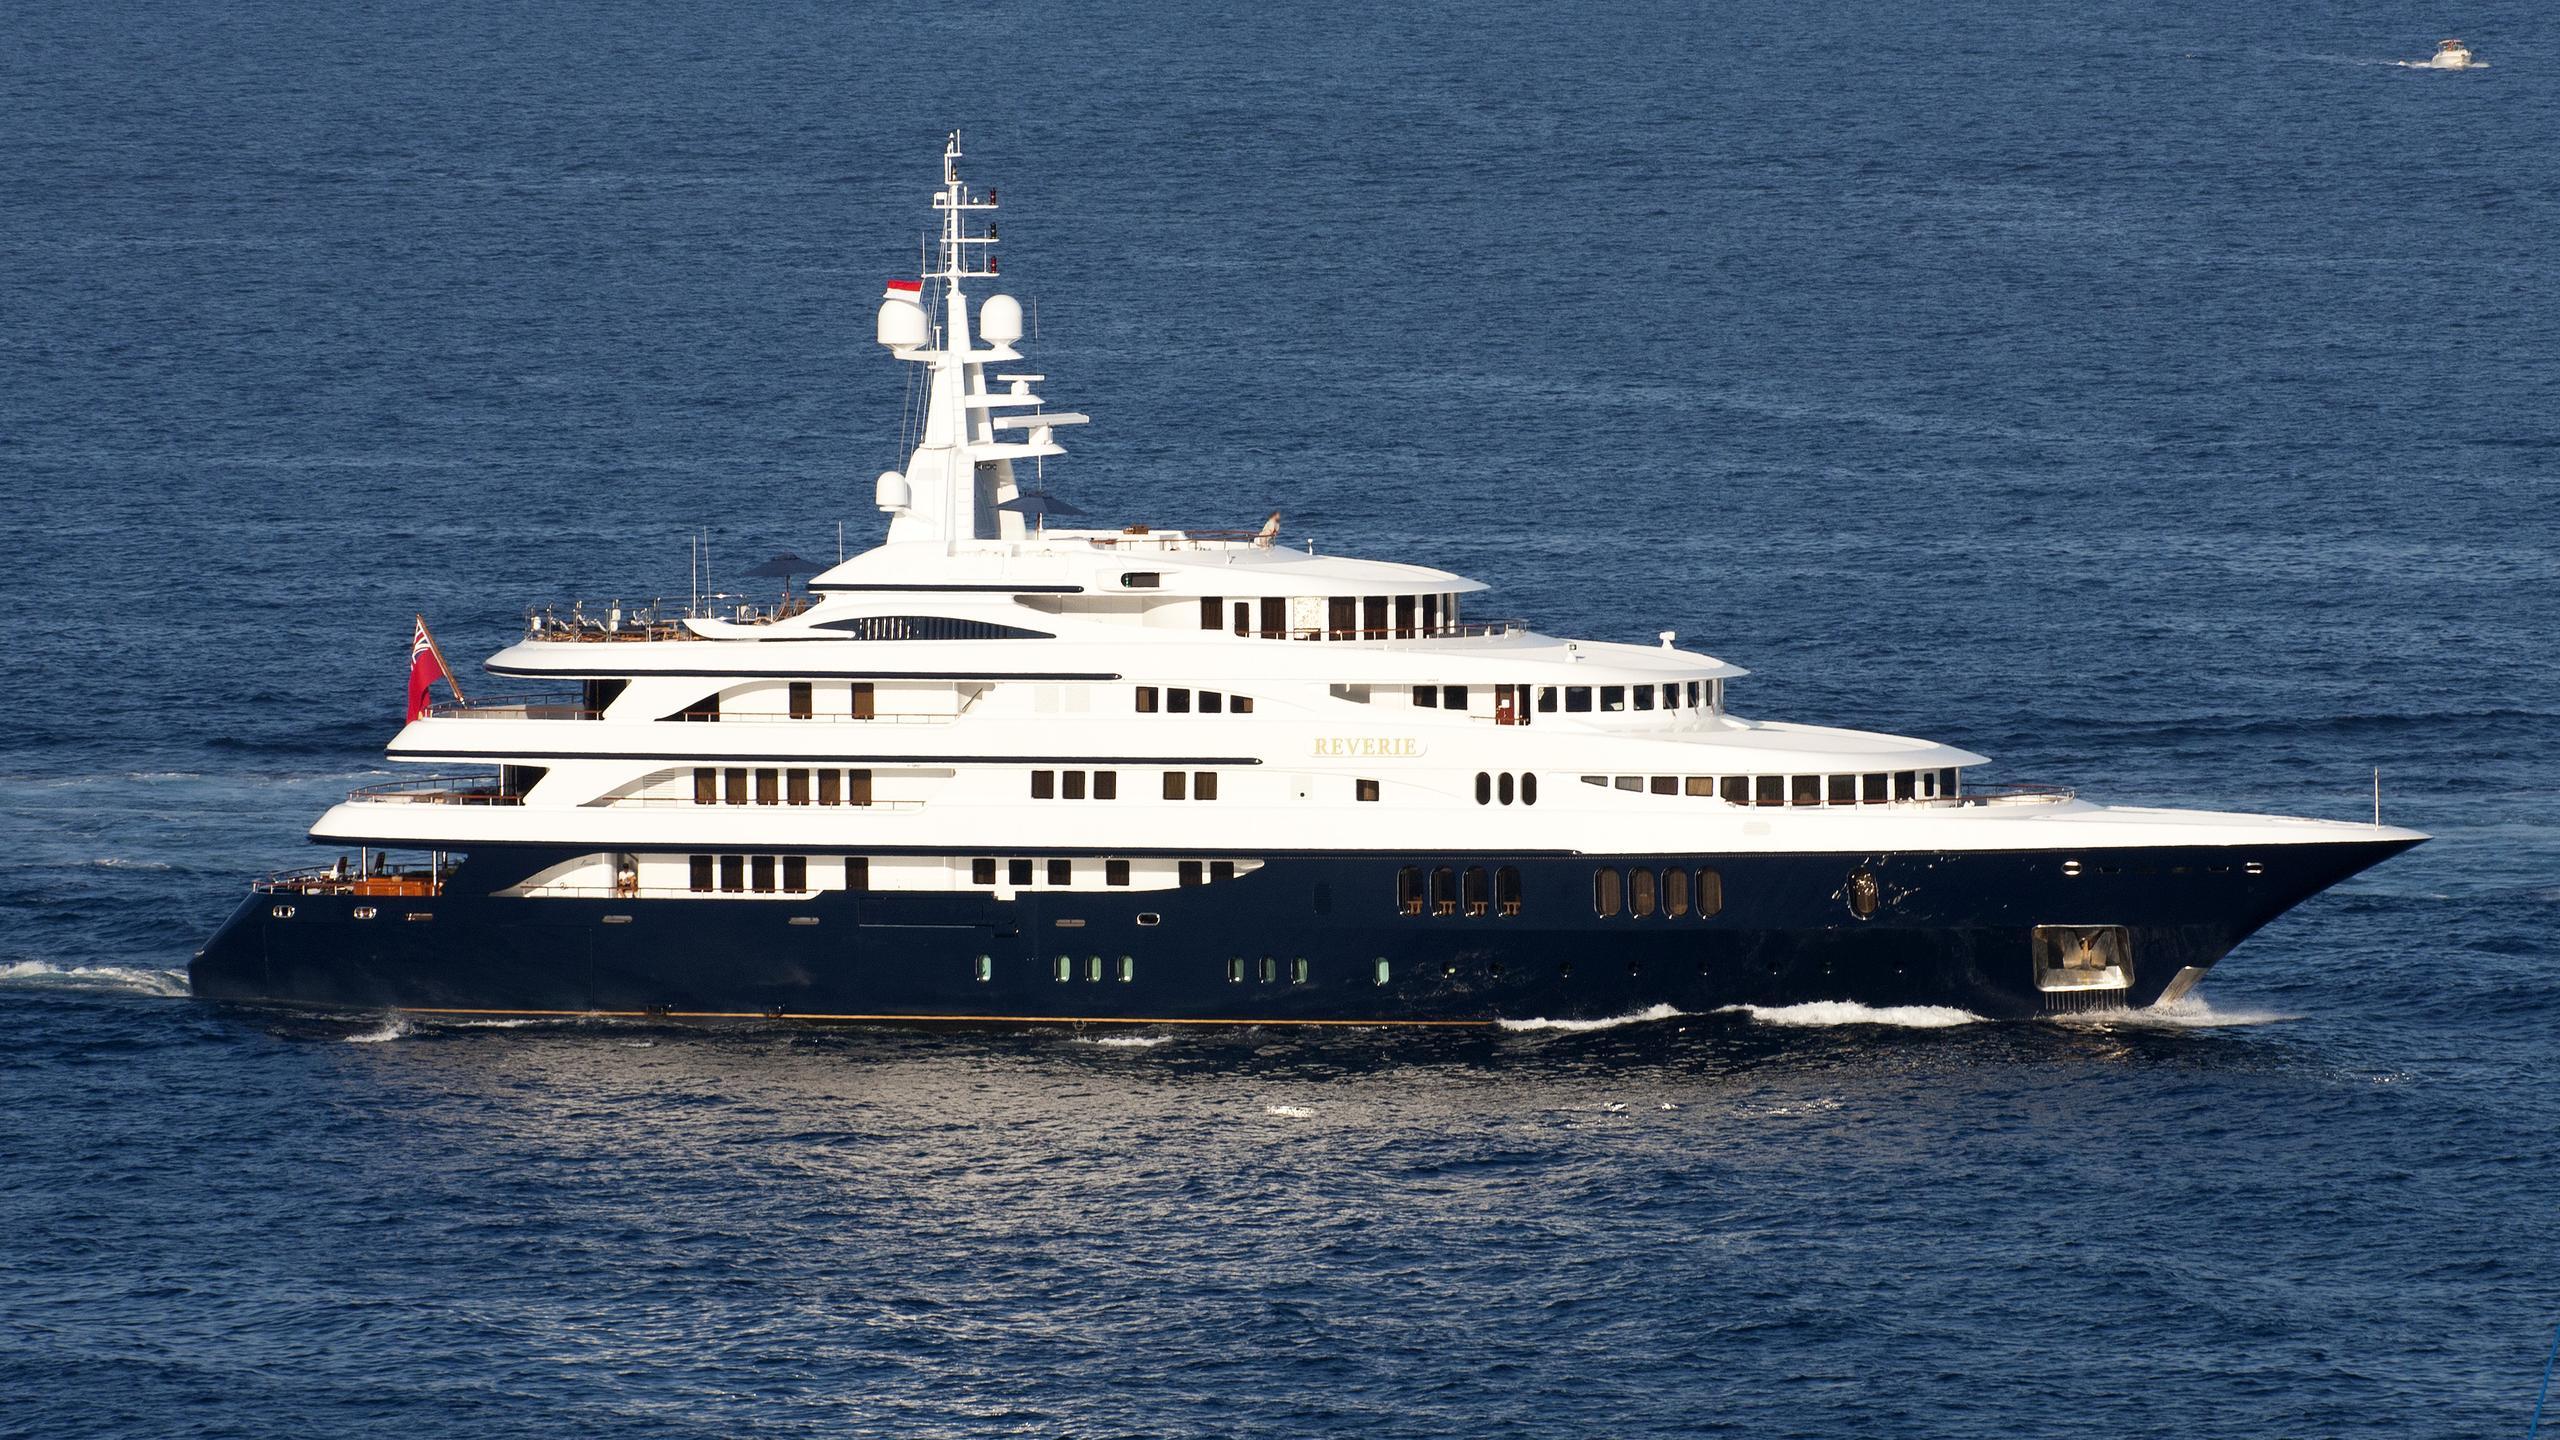 freedom-motor-yachtbenetti-2000-70m-cruising